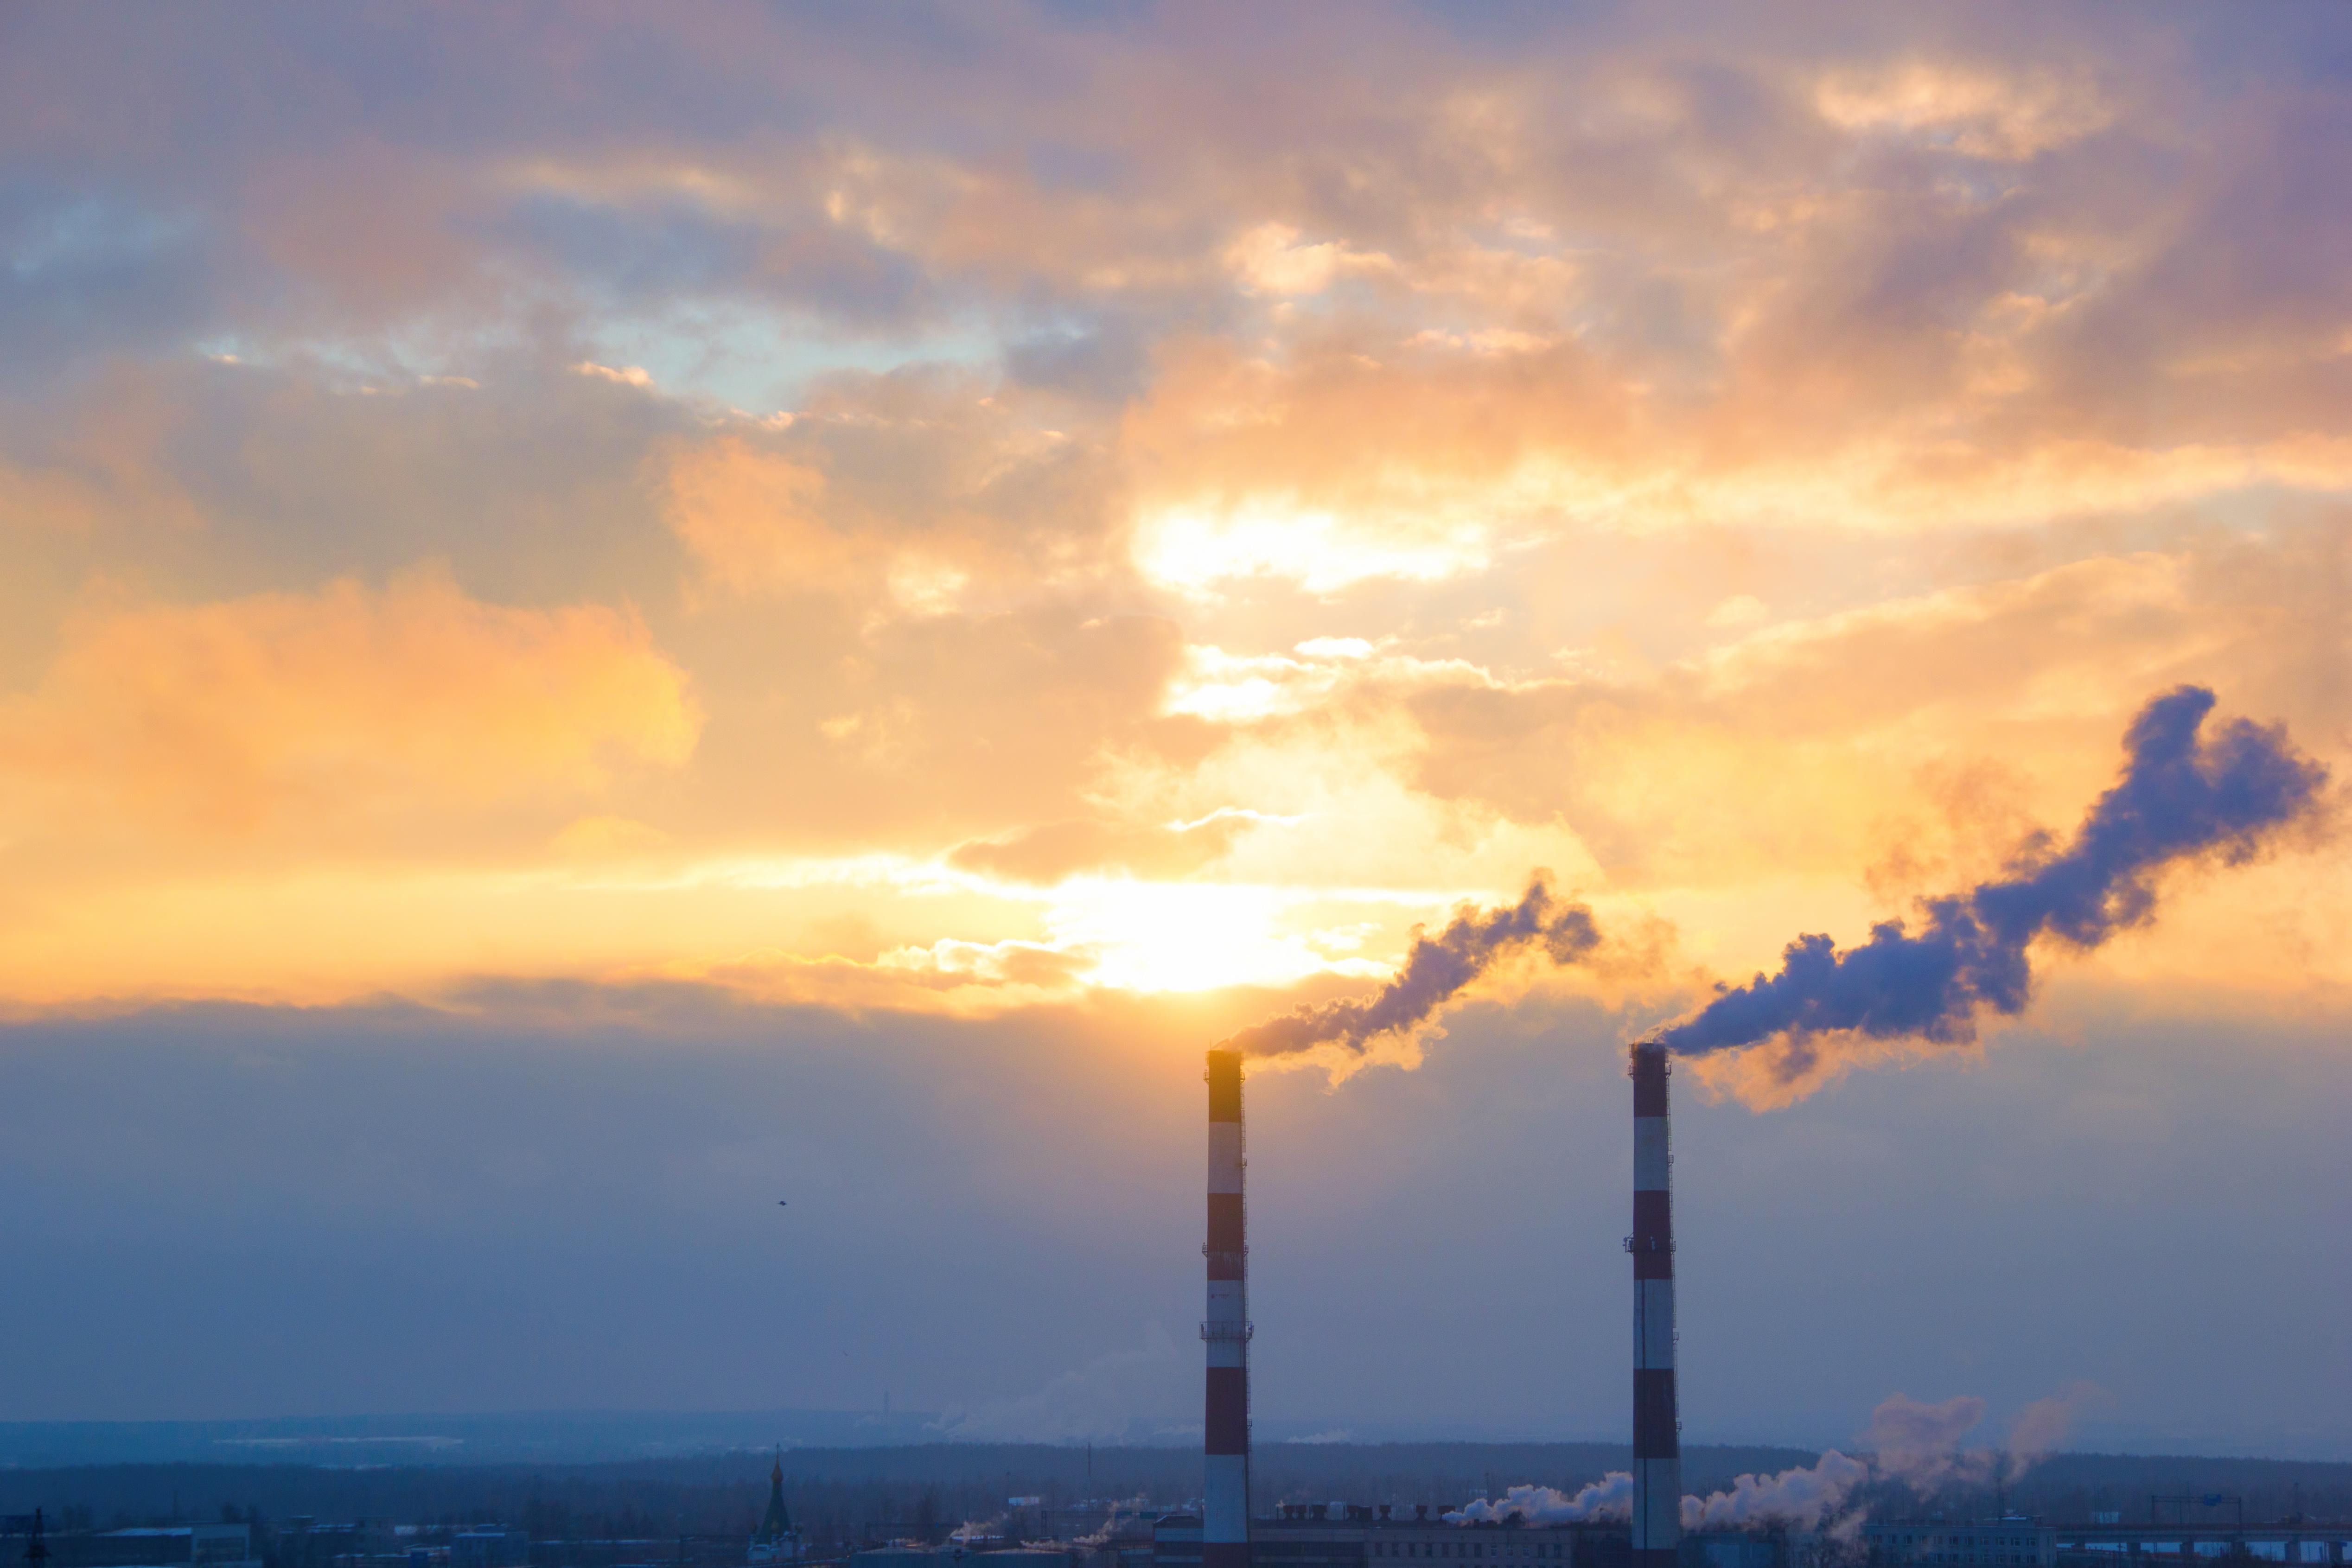 Smoke and sunset, Air, Sky, Tube, Toxic, HQ Photo